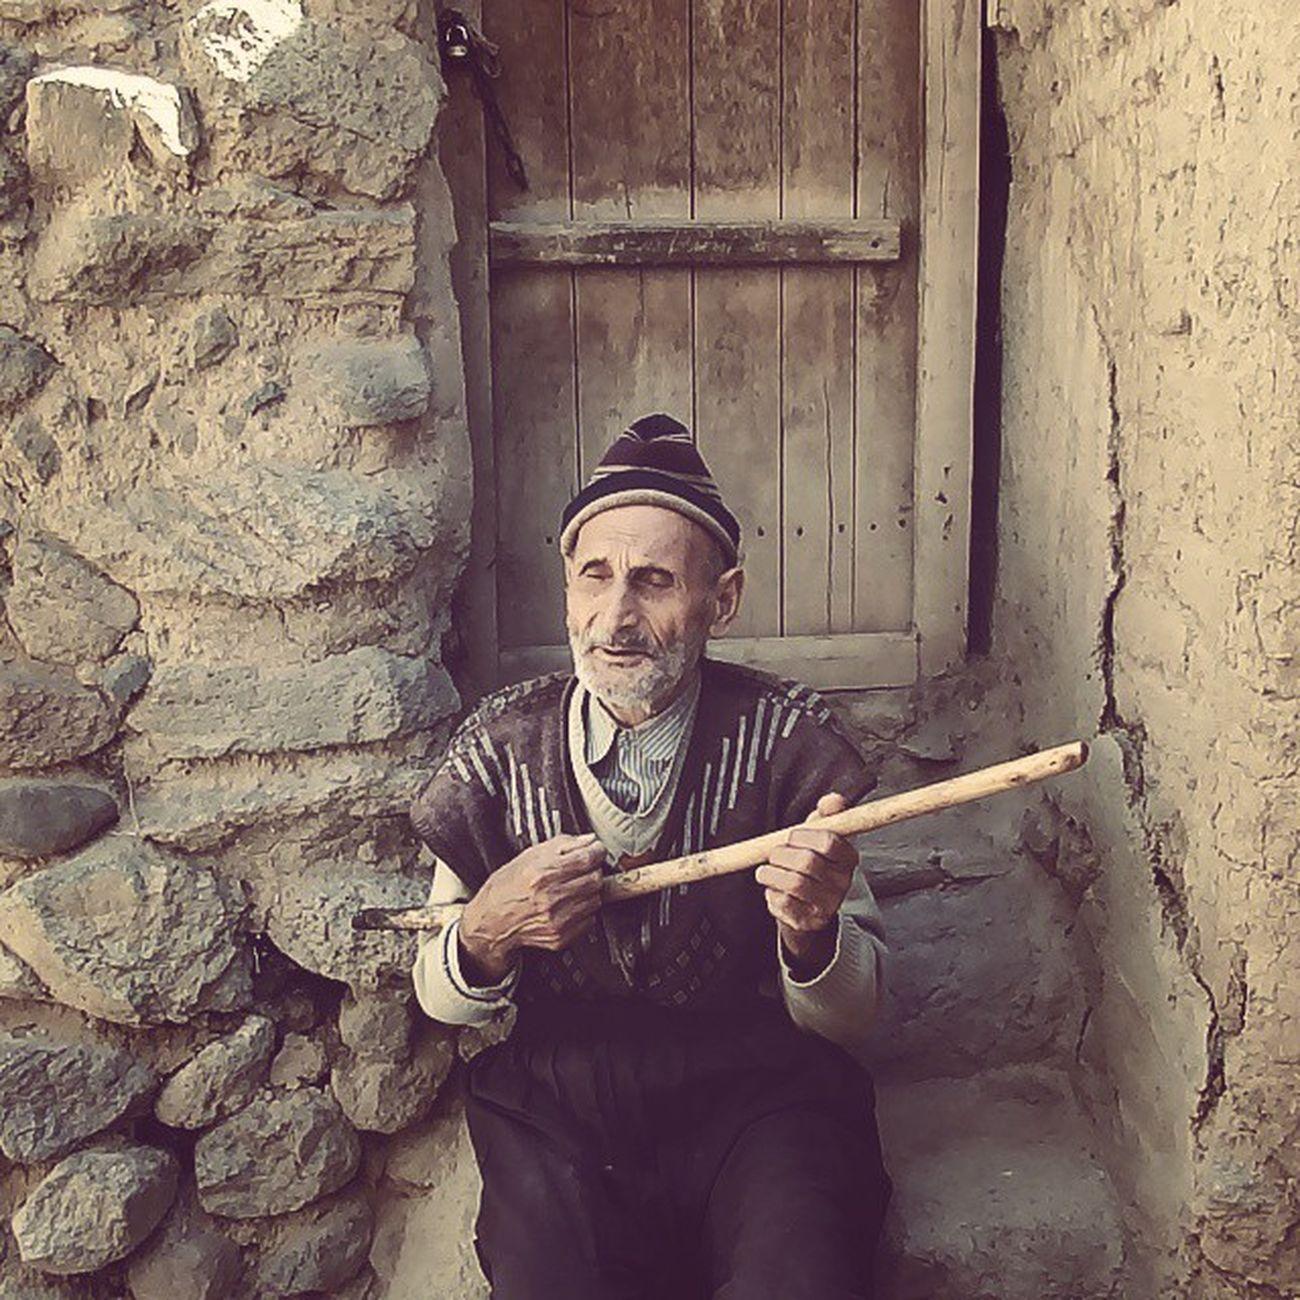 Oldman Blind Elderly سحرگه به راهی یکی پیر دیدم سوی خاک خم گشته از ناتوانی بگفتم: چه گم کردهای اندرین راه؟ بگفتا جوانی، جوانی، جوانی .. ملکالشعرا پیرمرد روستا کندوان